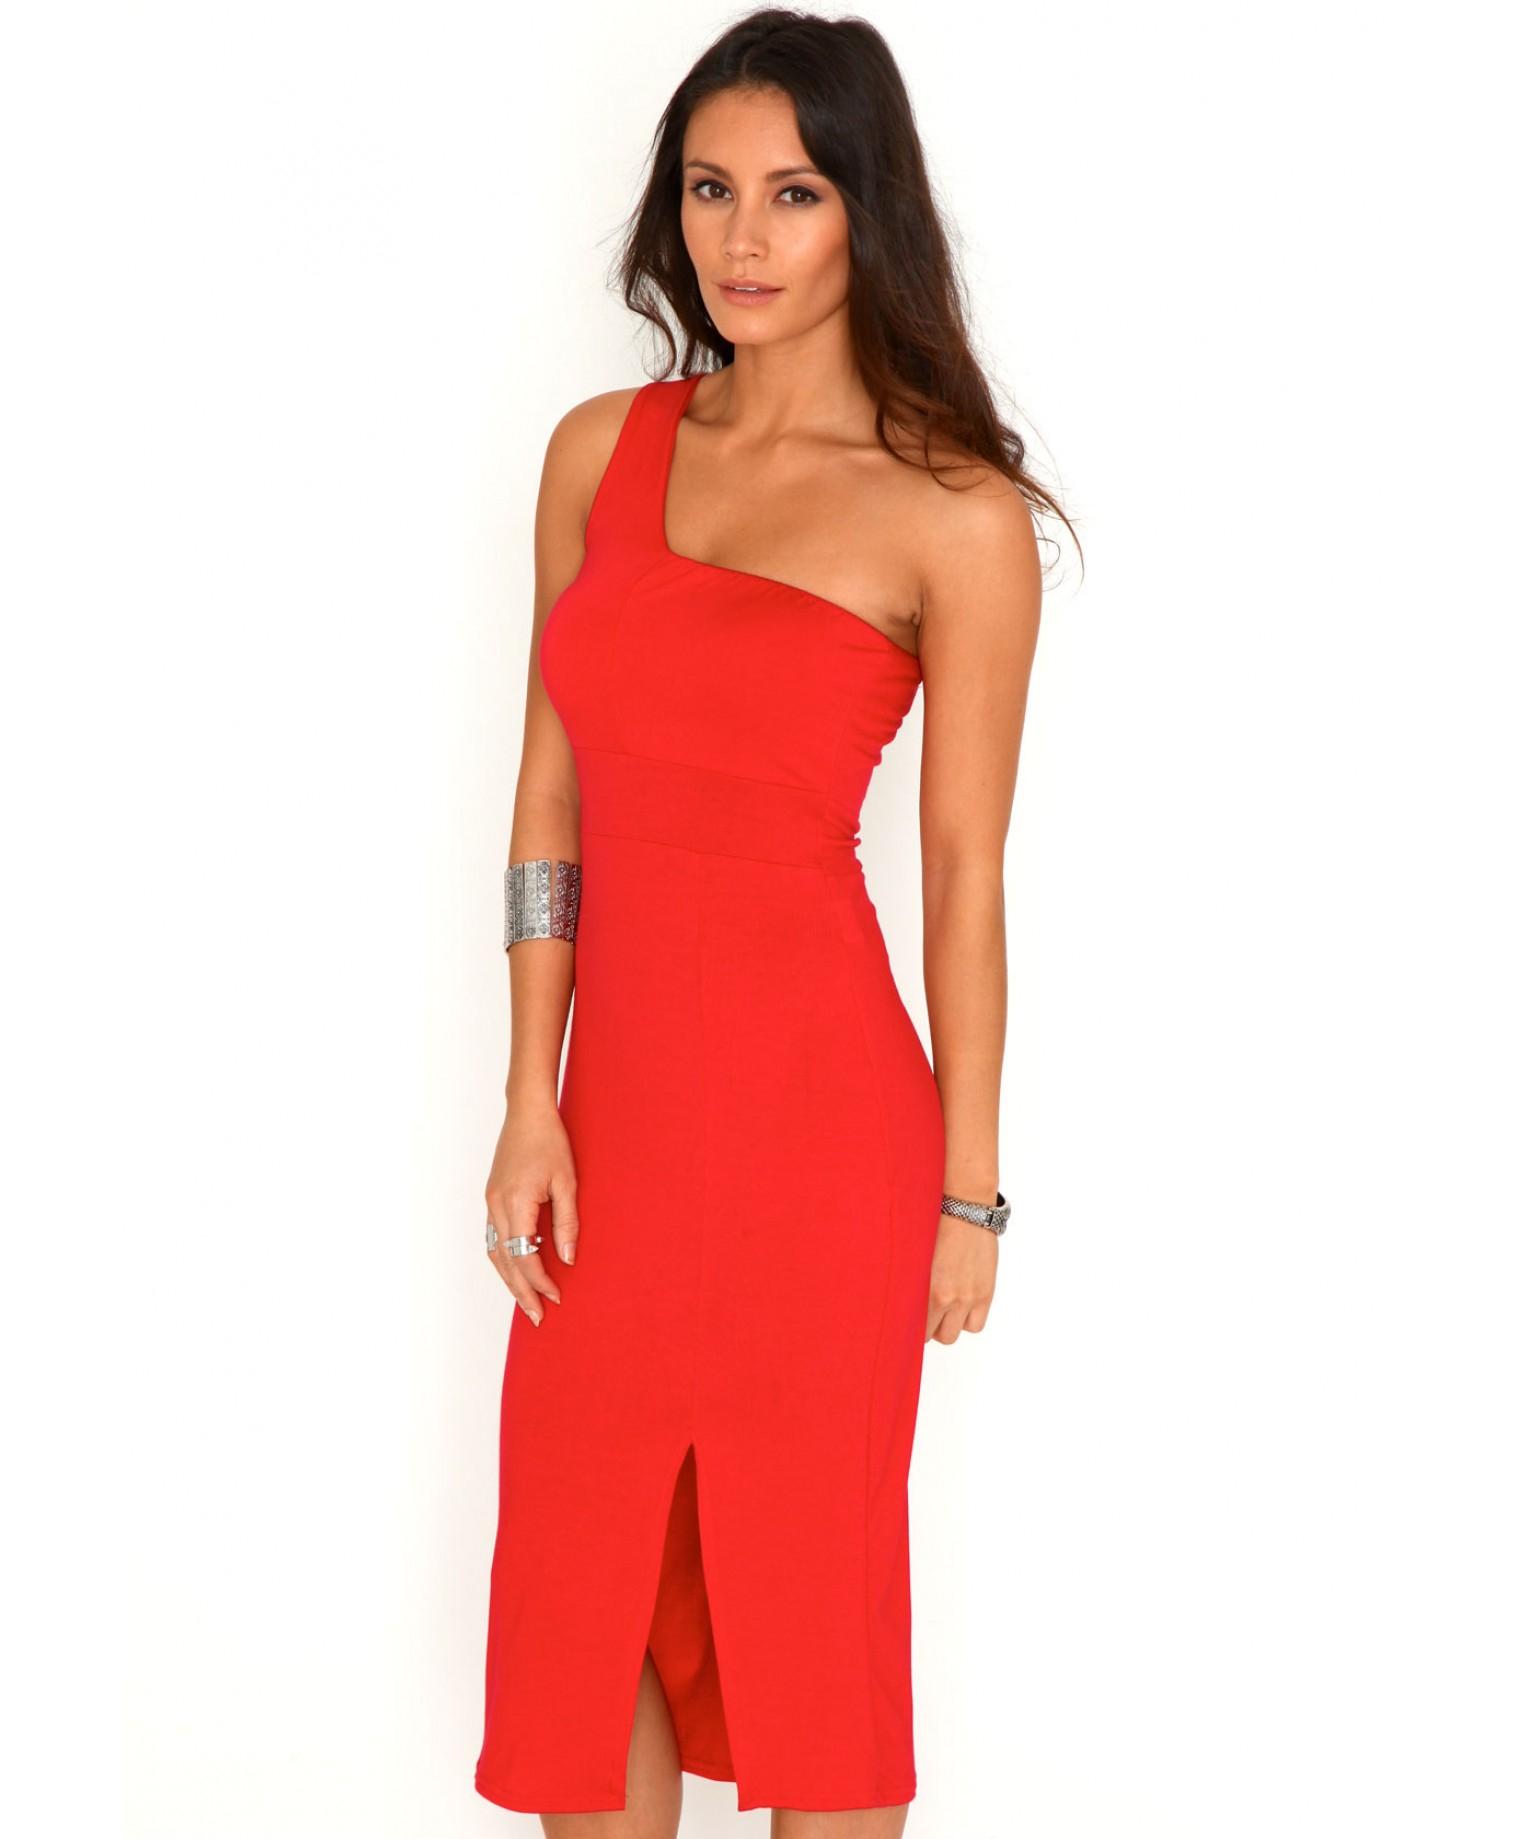 Missguided Rhoni One Shoulder Side Split Midi Dress In Red